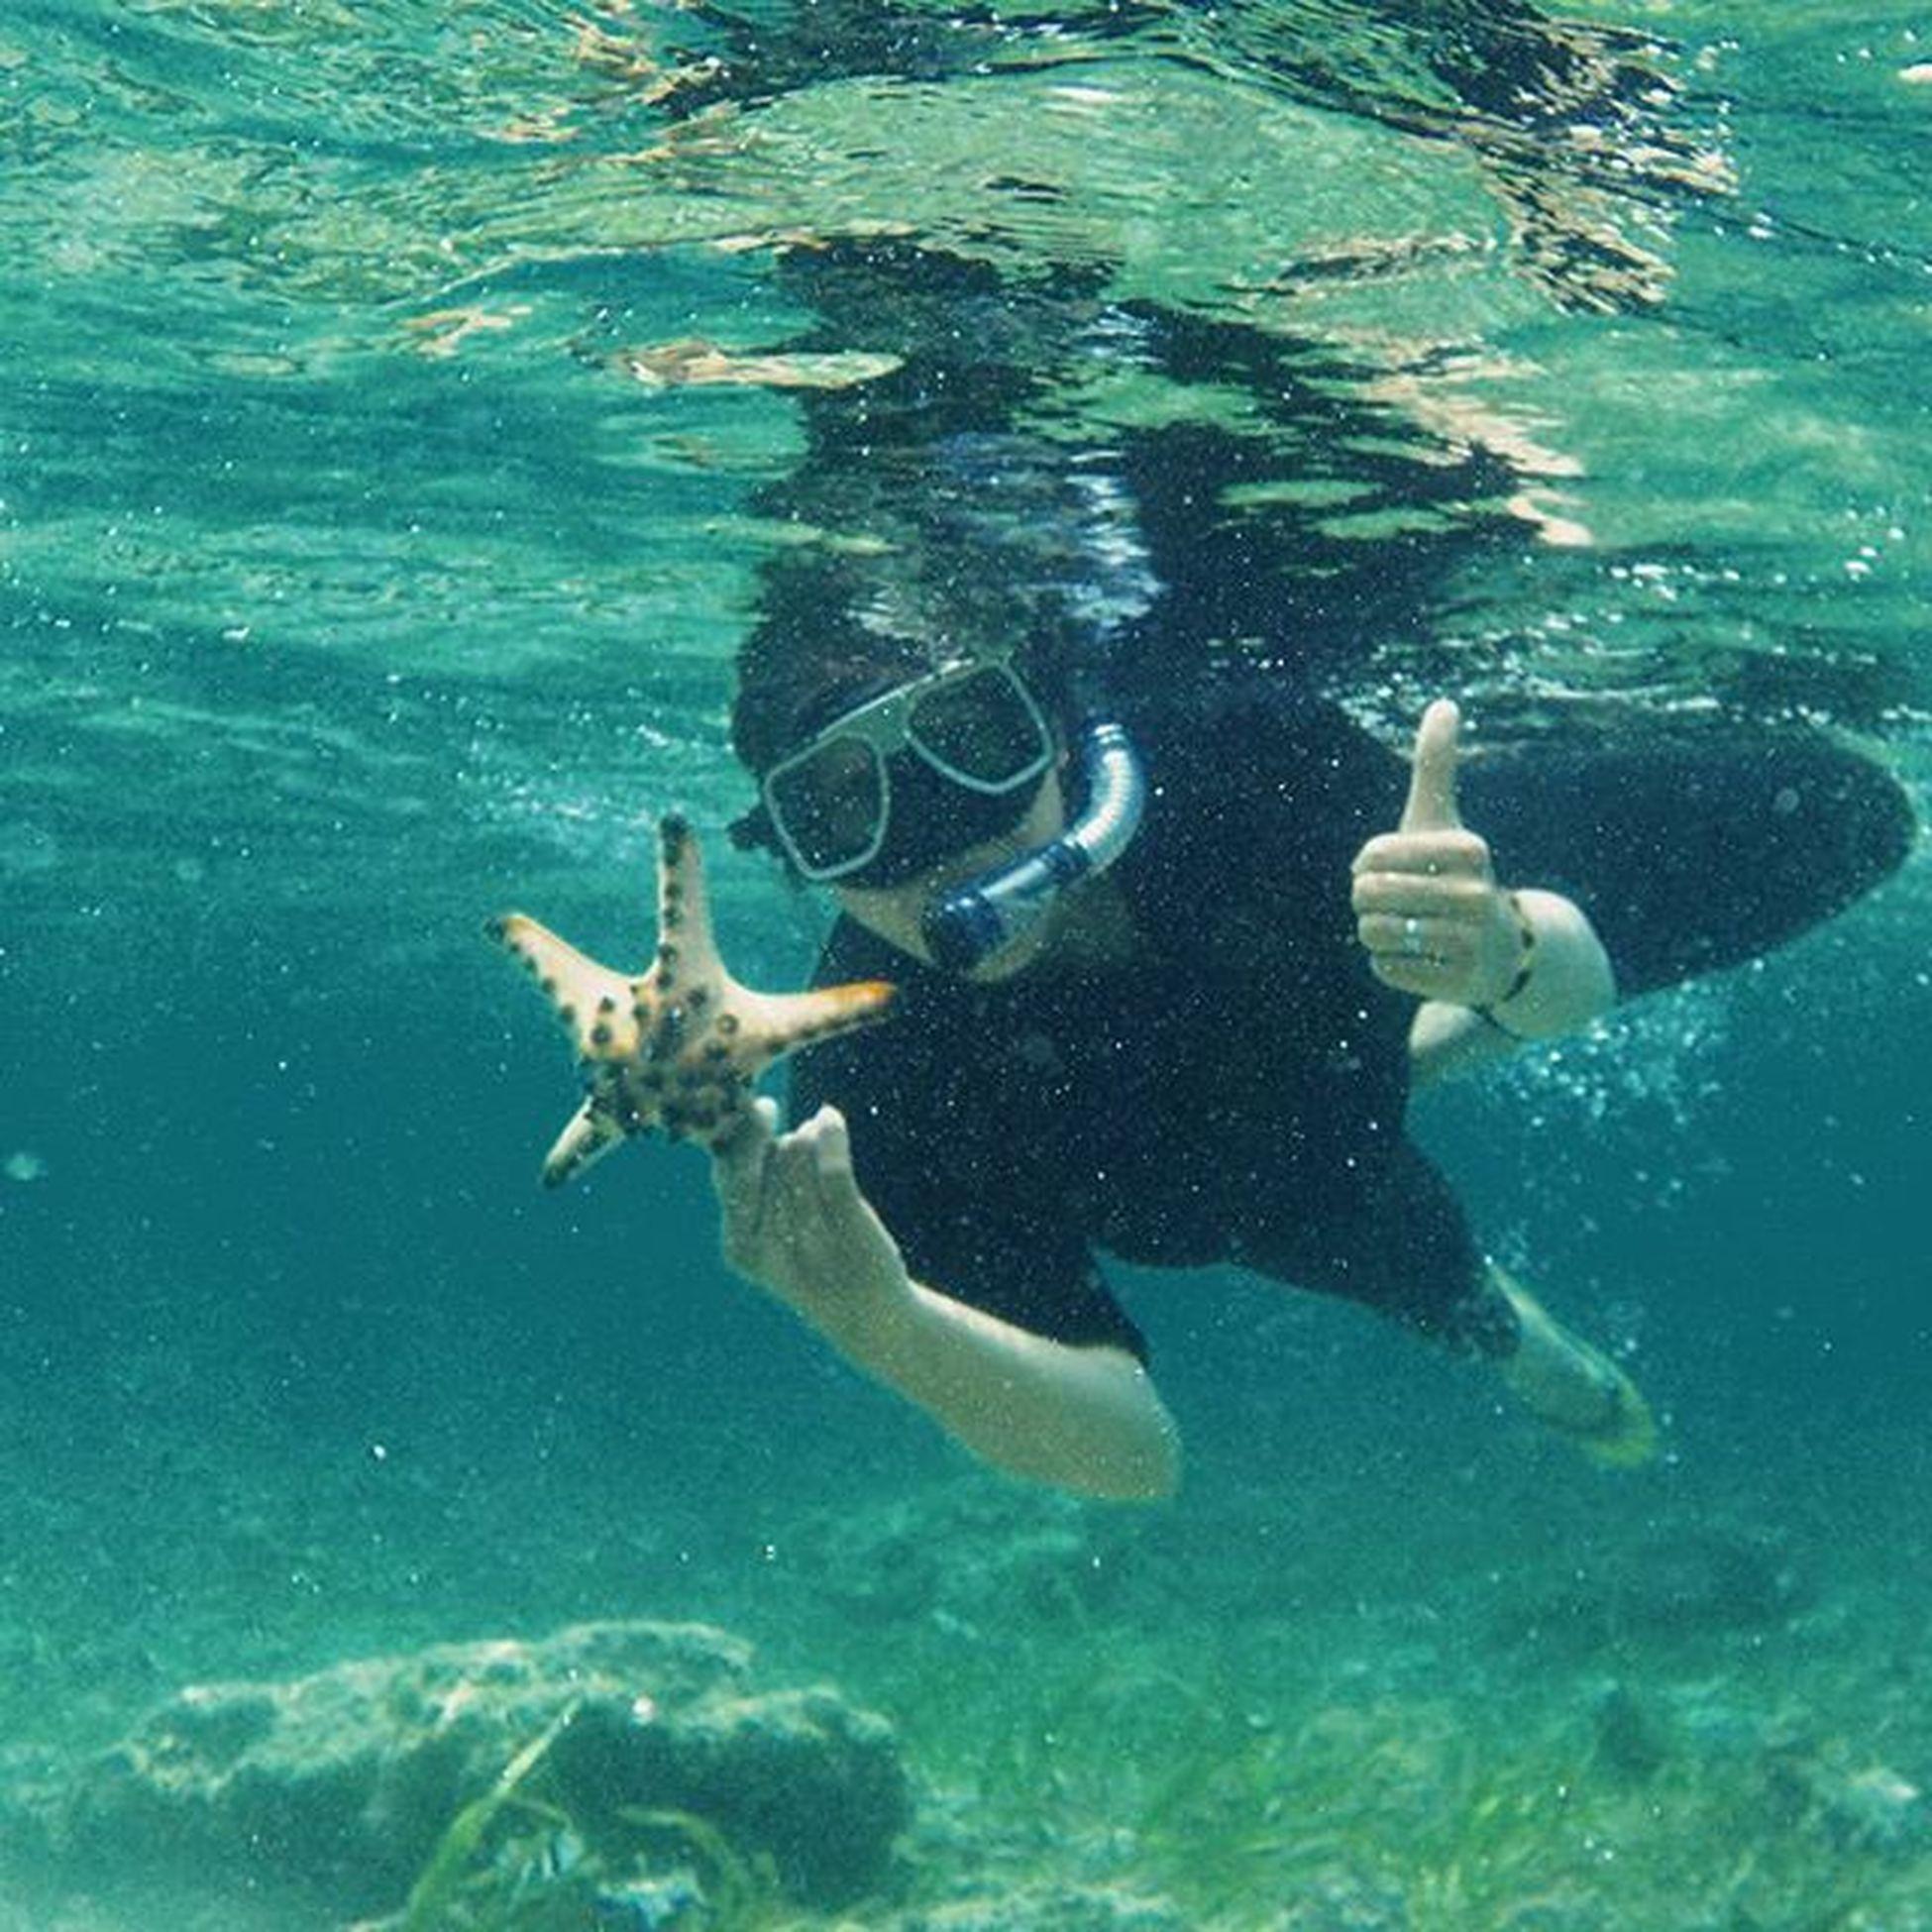 Ada keindahan di dalamnya... I LOVE IT...😍😍😍 . . . . Snorkeling Sabangtendetolitoli Sabangtendebeach Tolitoli Toliz Instaday Instatoliz Instapalu Instagram InstanusantaraPalu